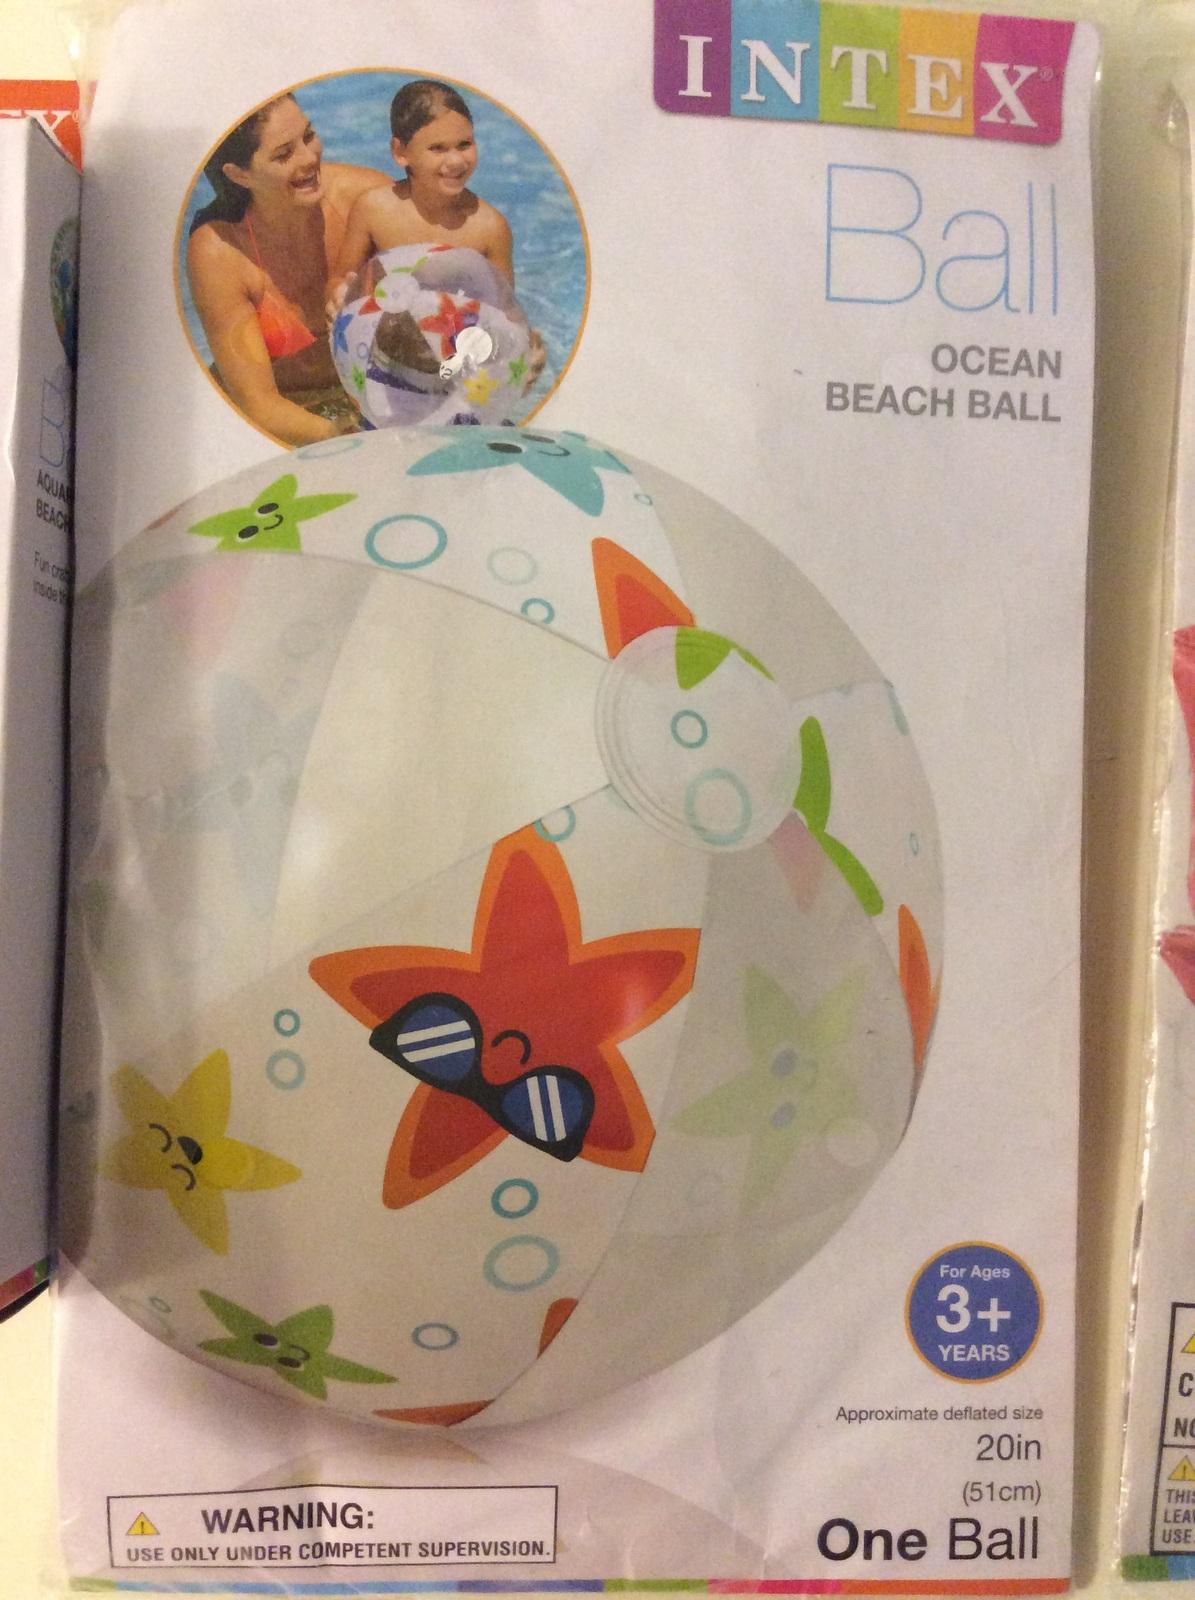 Intex Beach Pool Ball and Arm Band Set Lot of 3 pc